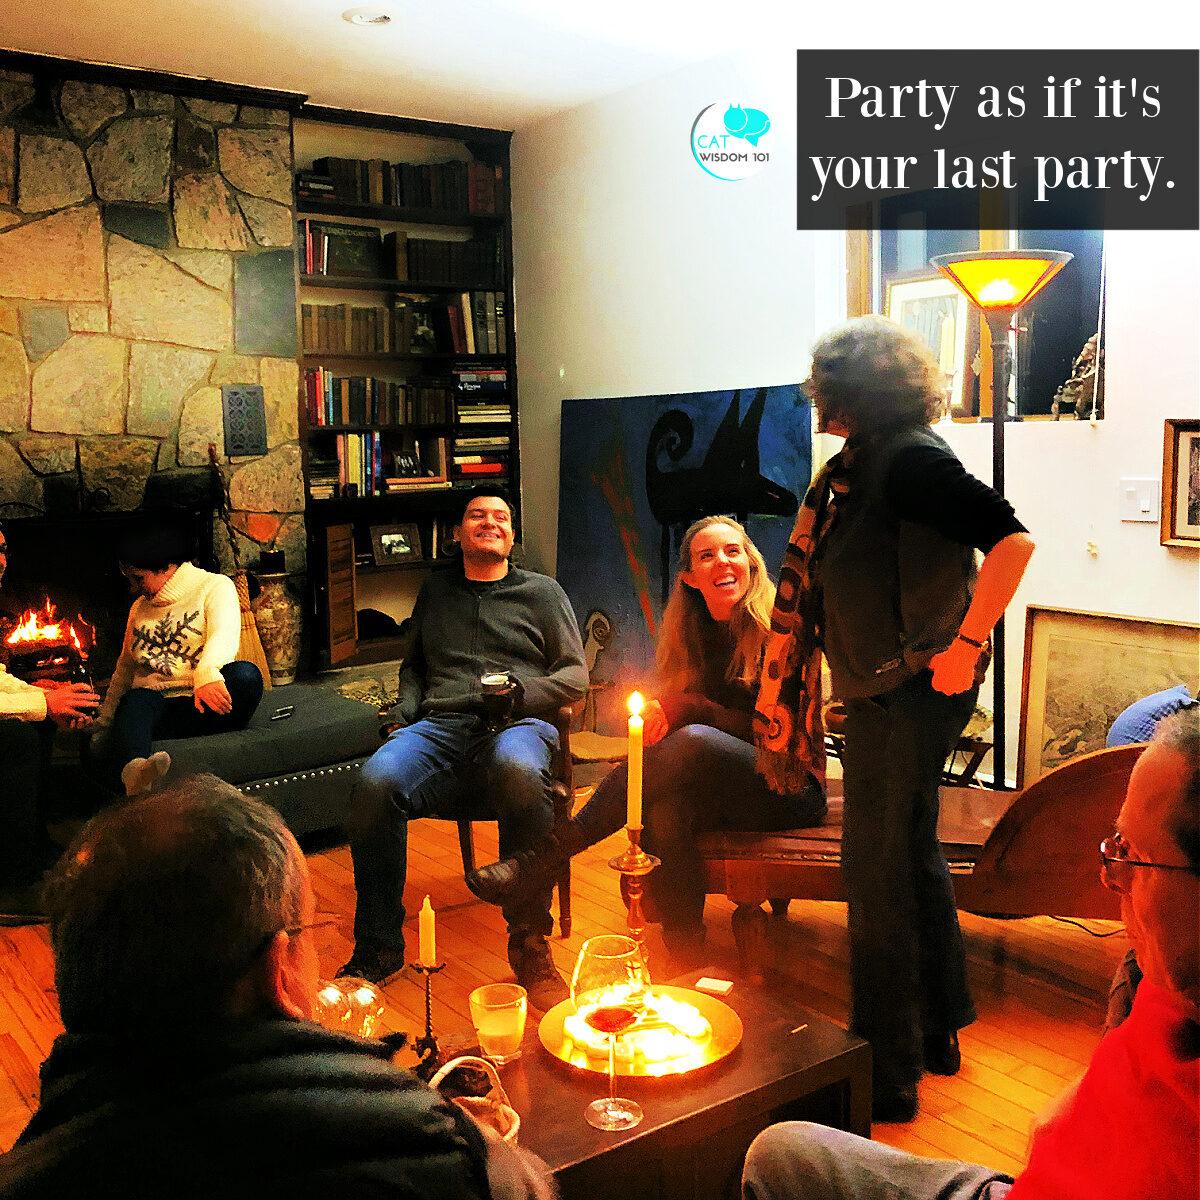 solstice party cat quote